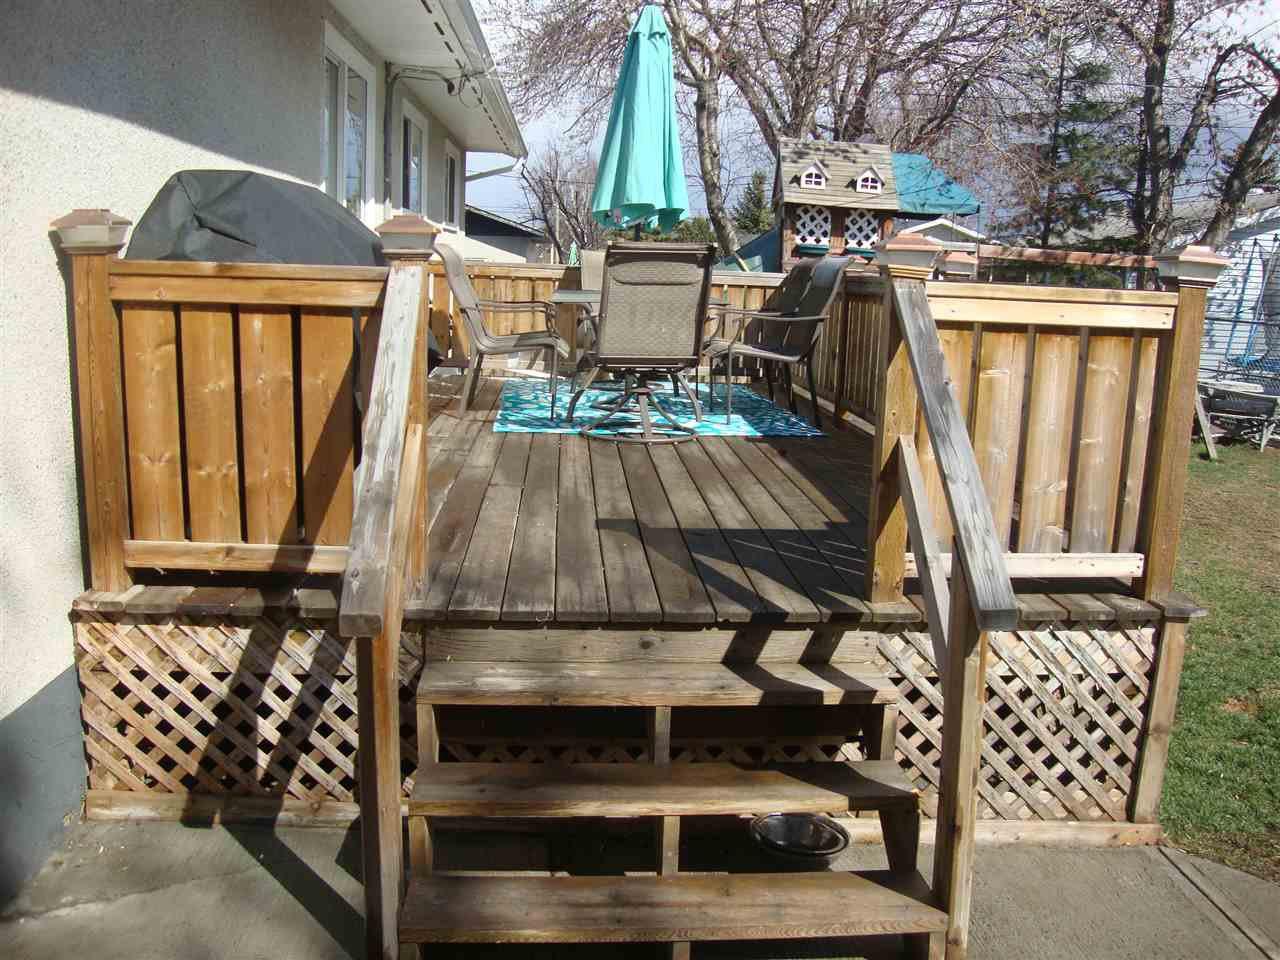 Photo 3: Photos: 4711 51A Avenue: Bon Accord House for sale : MLS®# E4149195